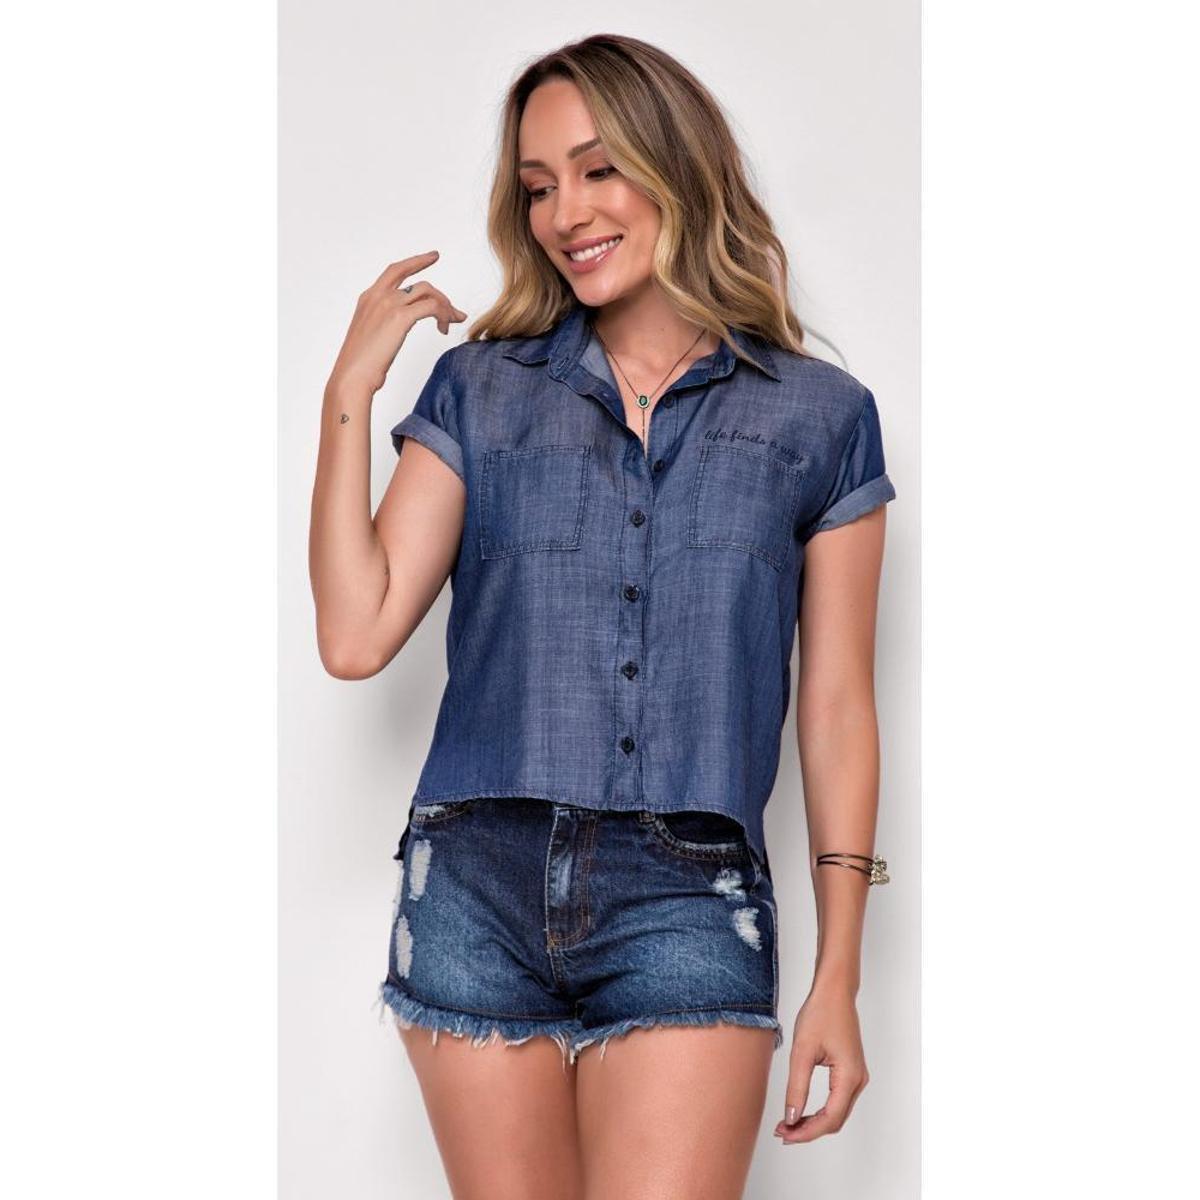 Camisa Jeans Zait Manga Curta Miss Rain com bolso frontal duplo - Azul